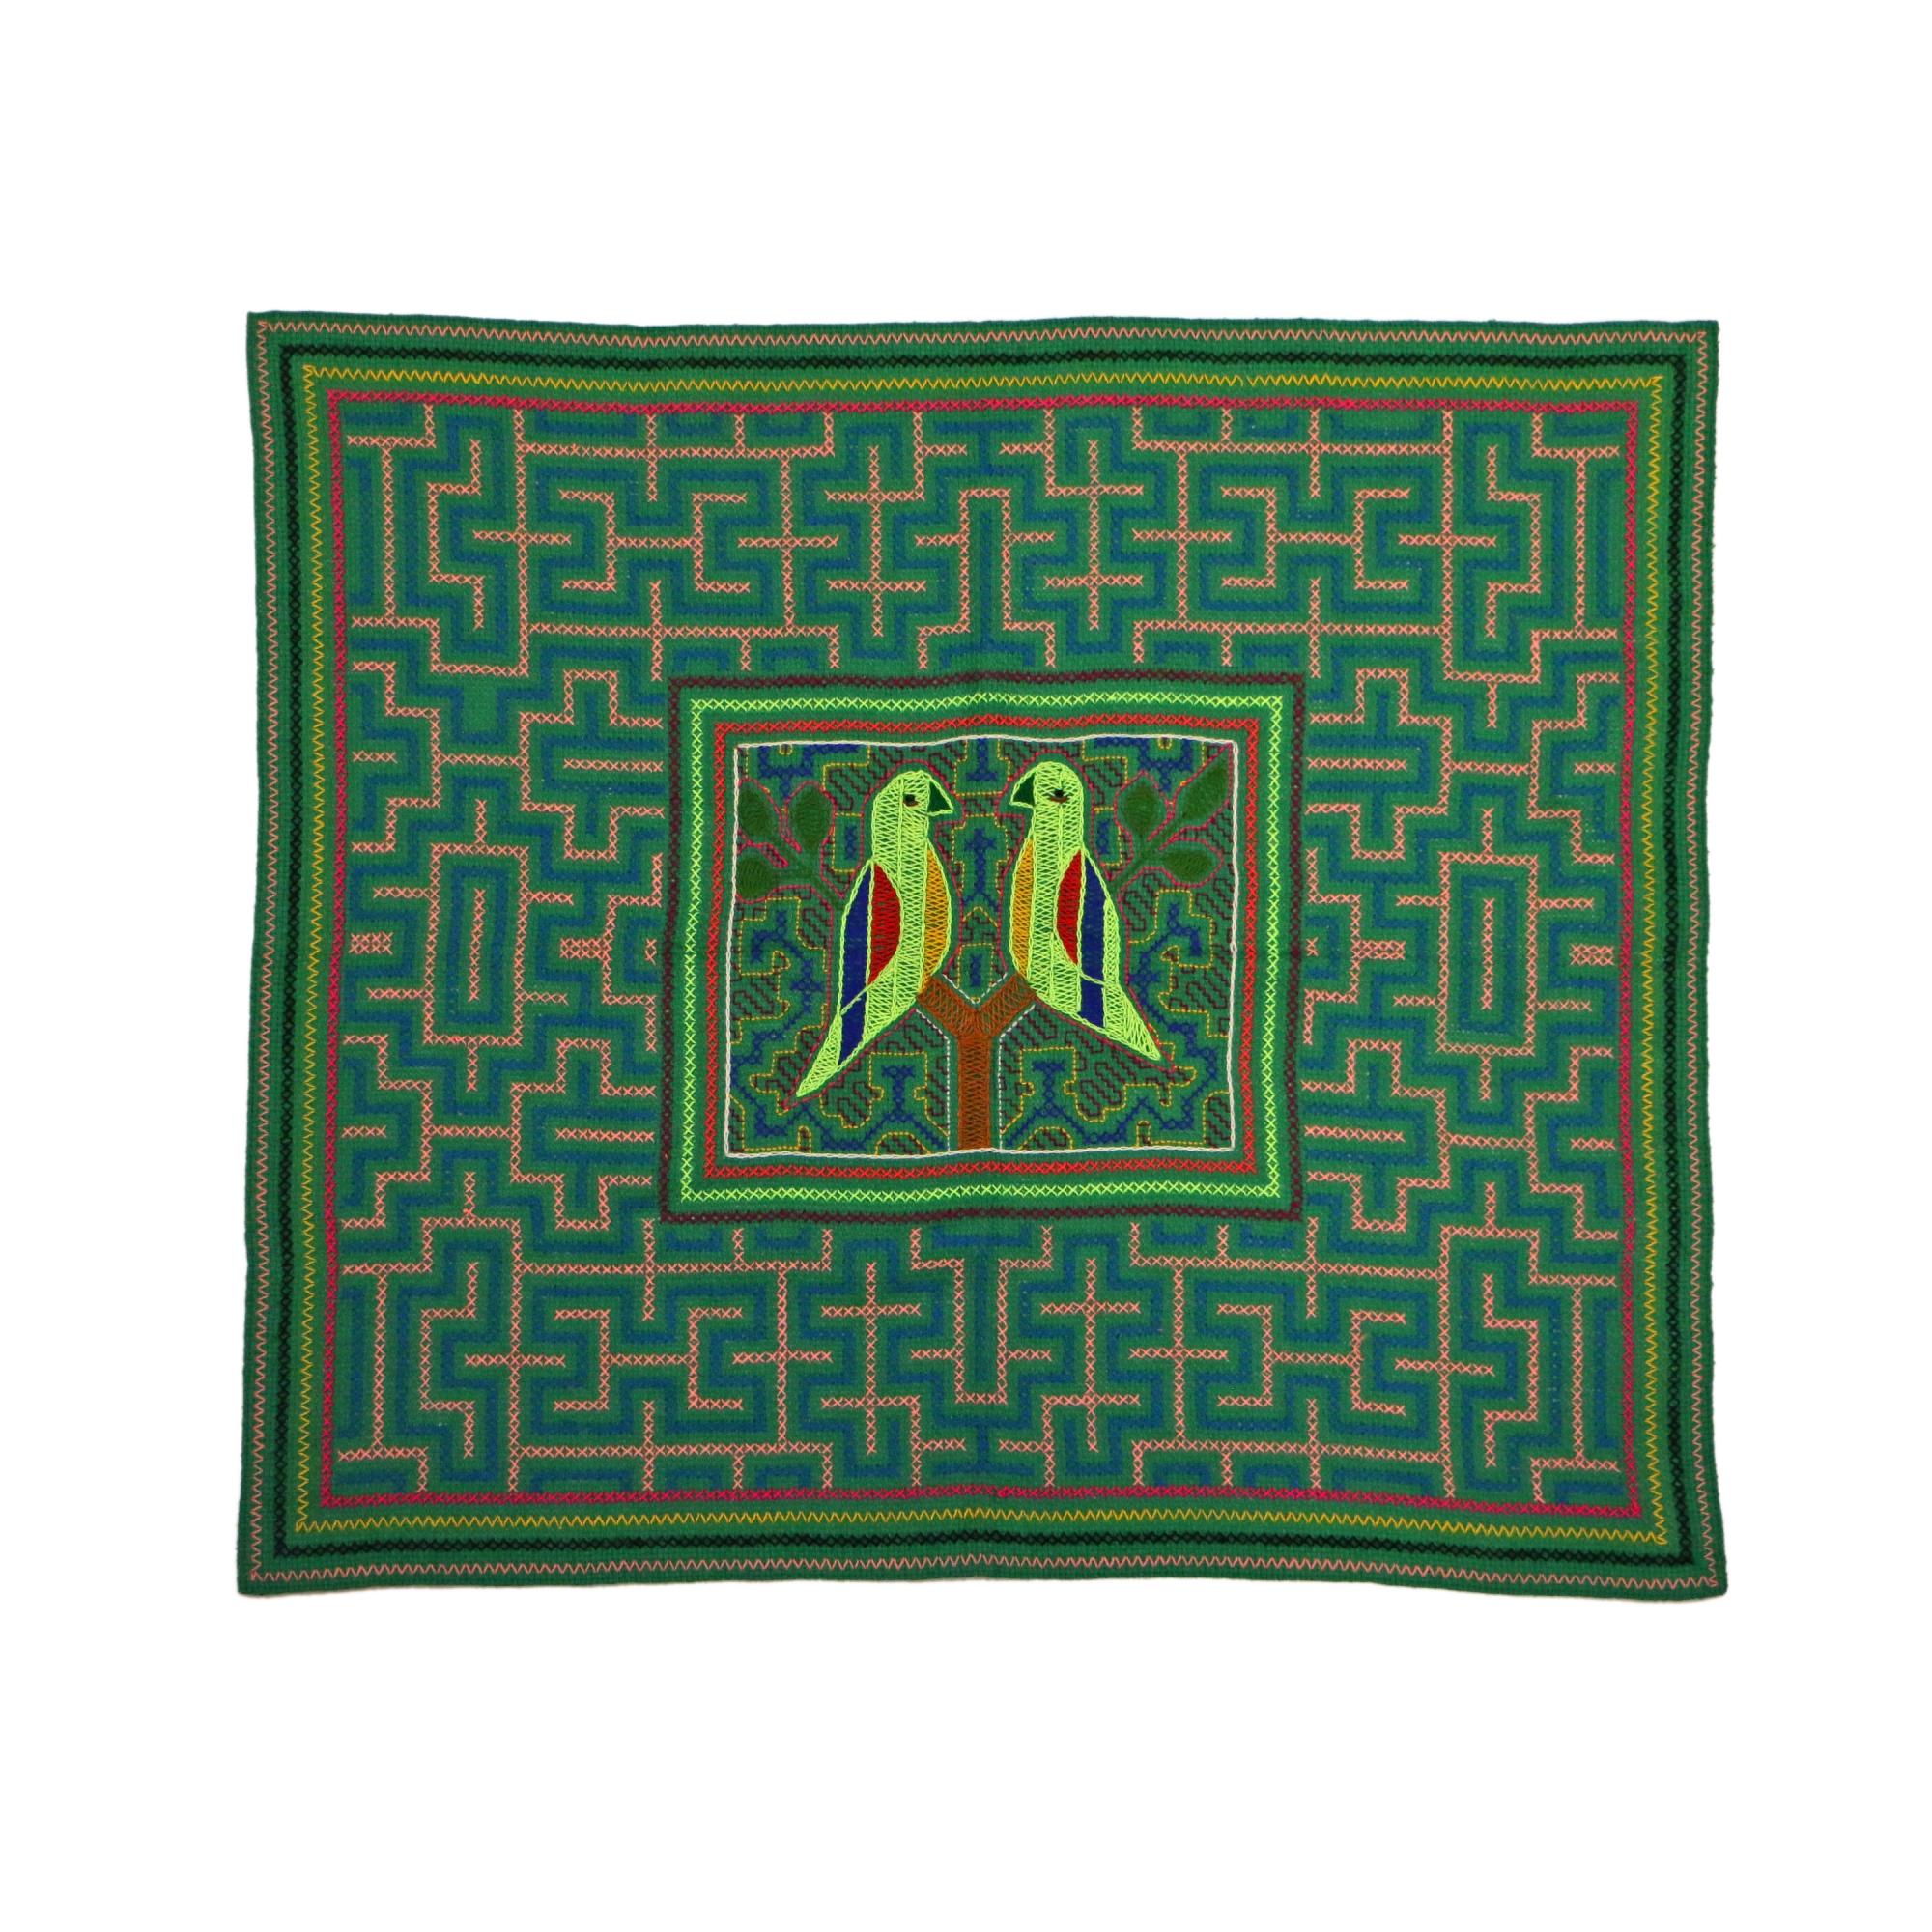 Textil bordado 1